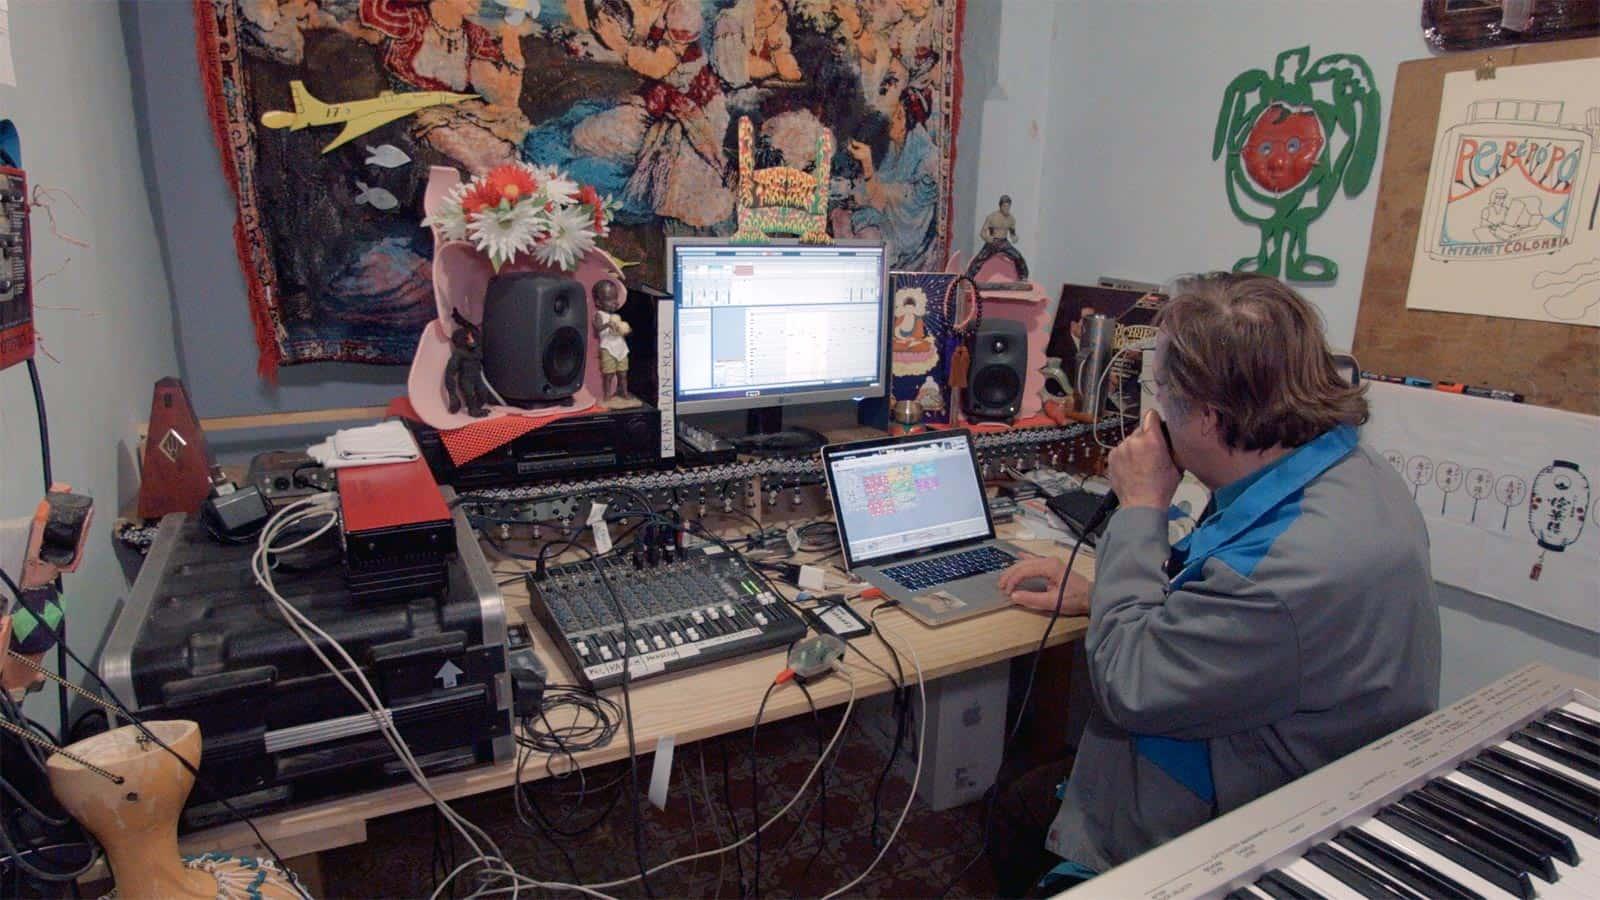 Dick-verdult-studio